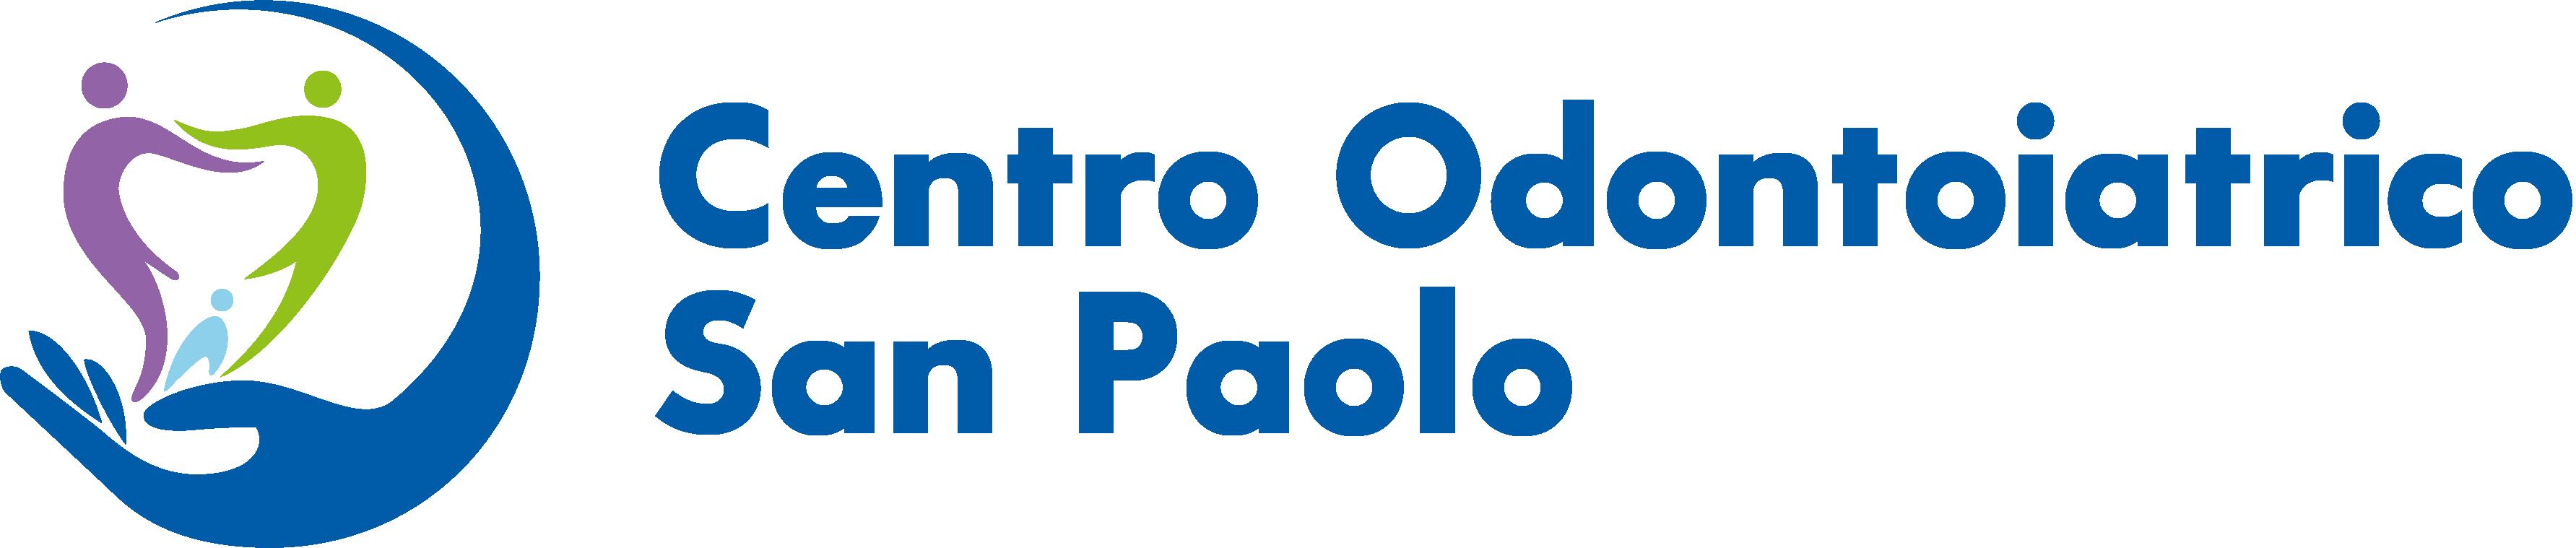 Centro Odontoiatrico San Paolo